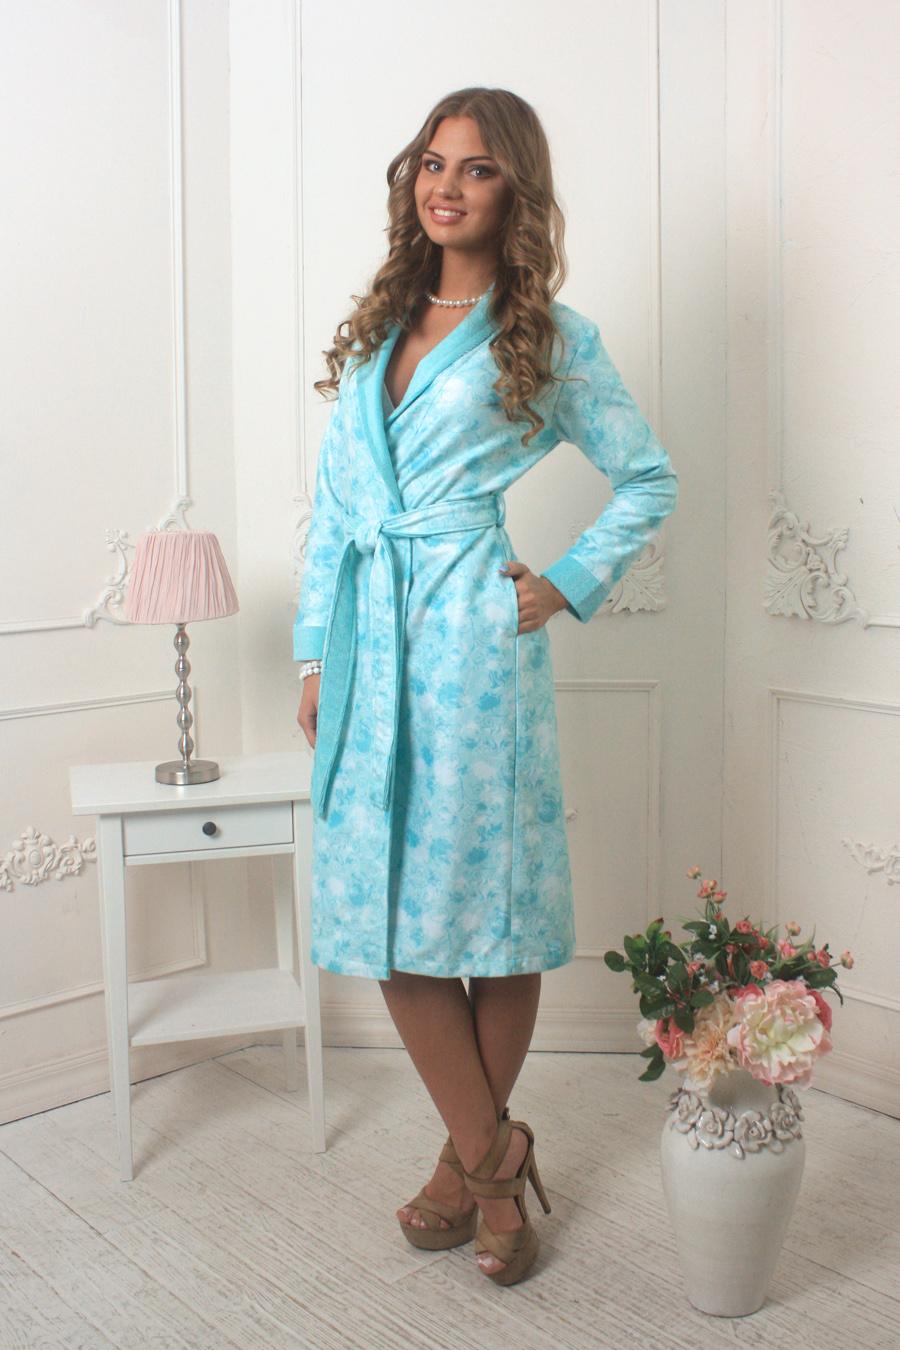 Халат женский Five Wien Home Liana, цвет: бирюзовый, белый. 452. Размер L/XL (48/50) платье liana